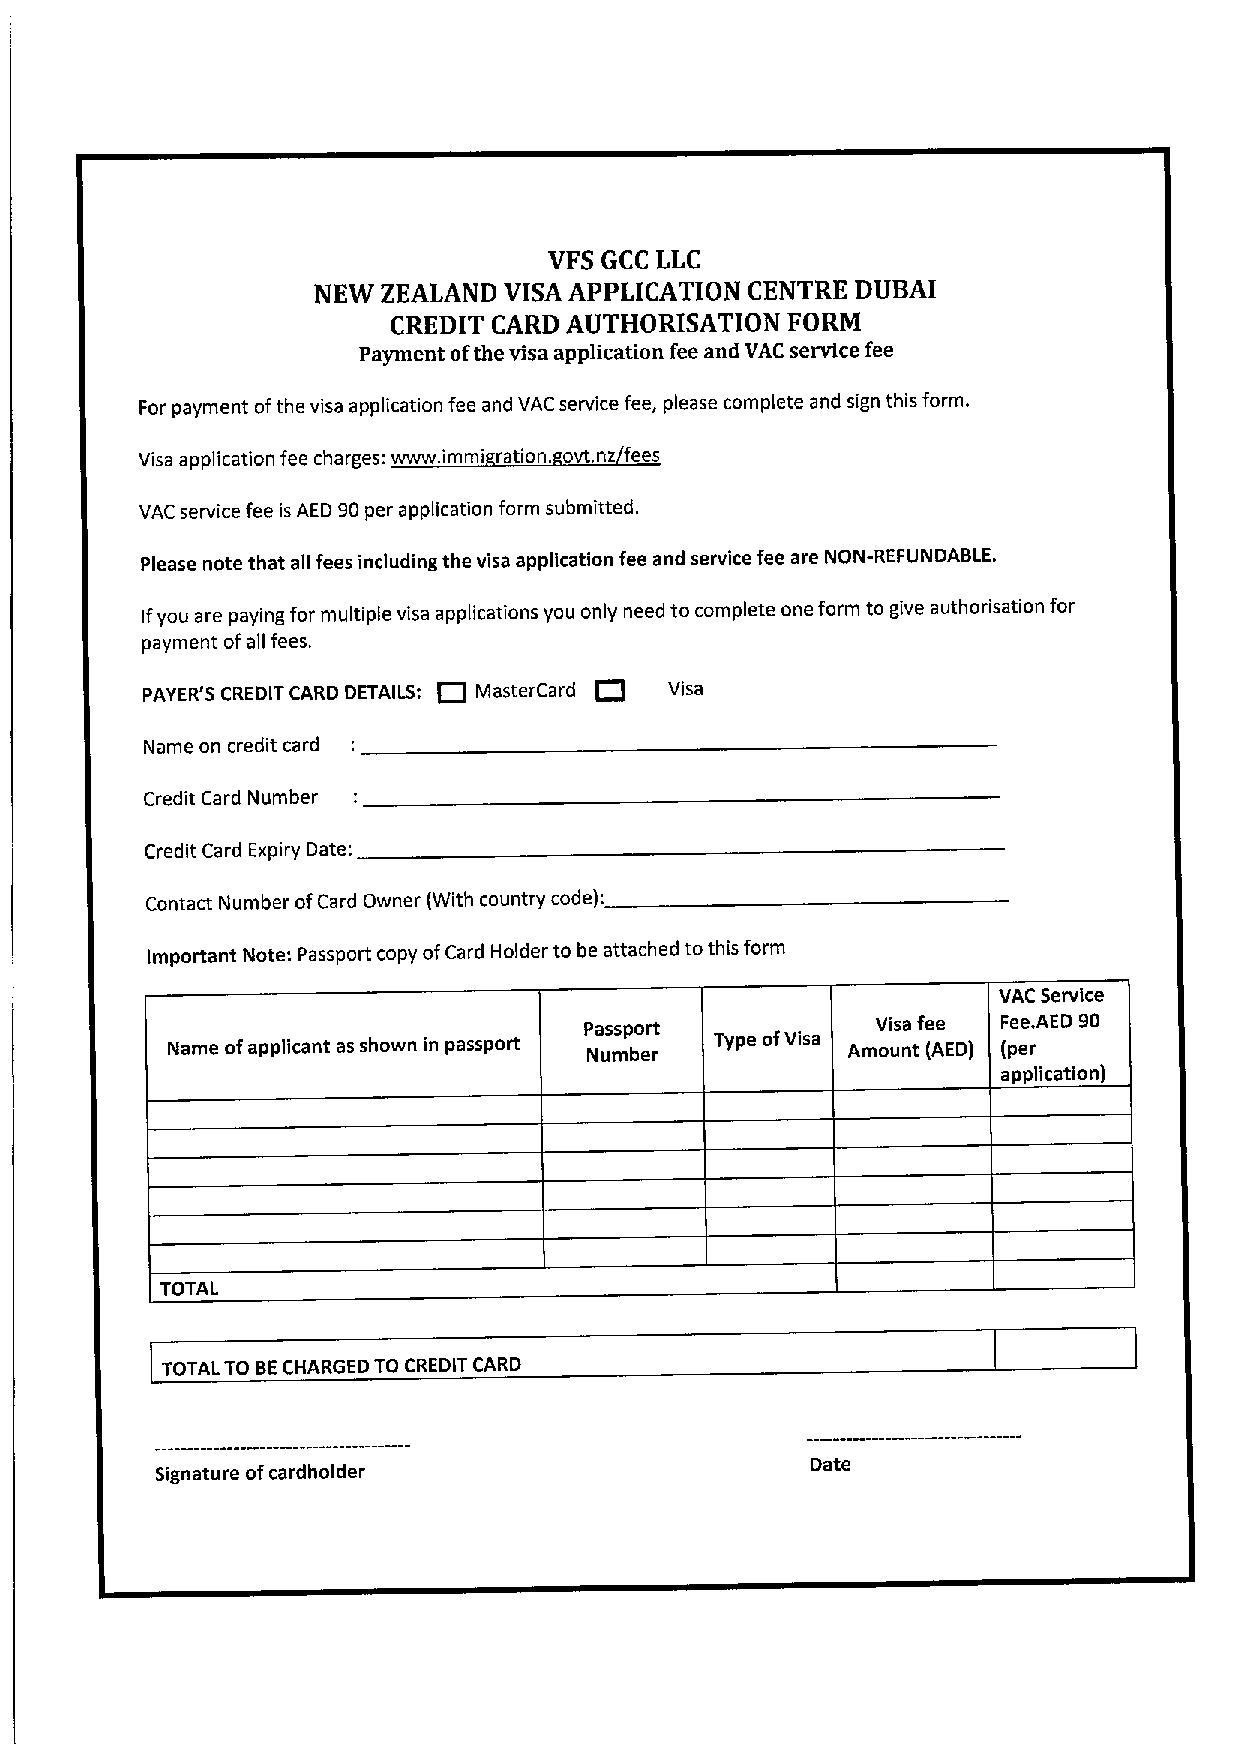 ���� ��� ������ ���� ����  ��������:NZ VAC Credit Card Authorisation Form-page-001.jpg ���������:66 ��������:210.0 �������� �����:30108